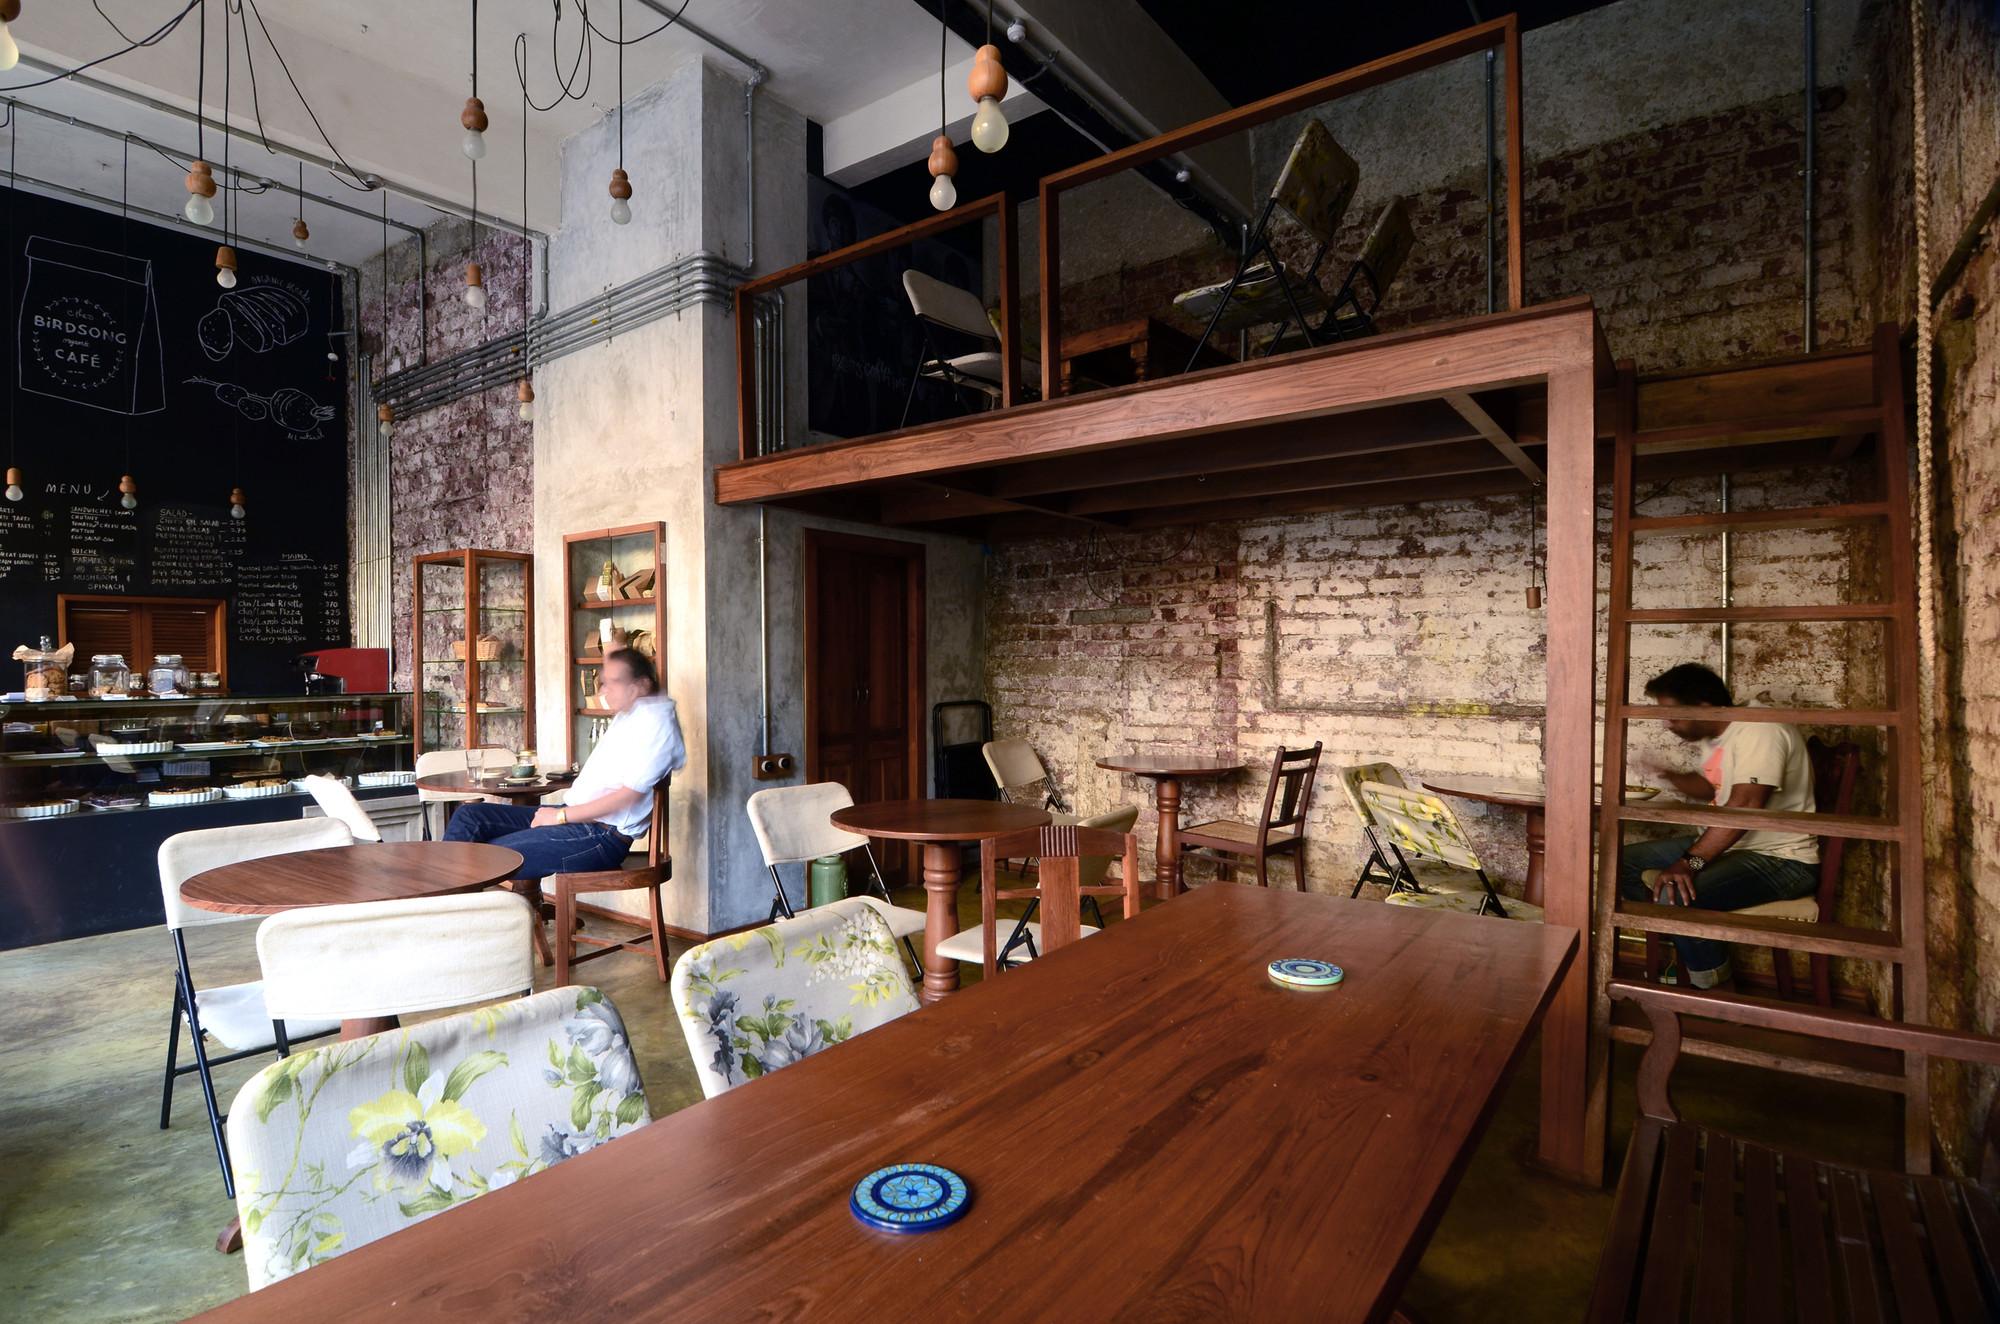 birdsong cafe / studio eight twentythree | archdaily